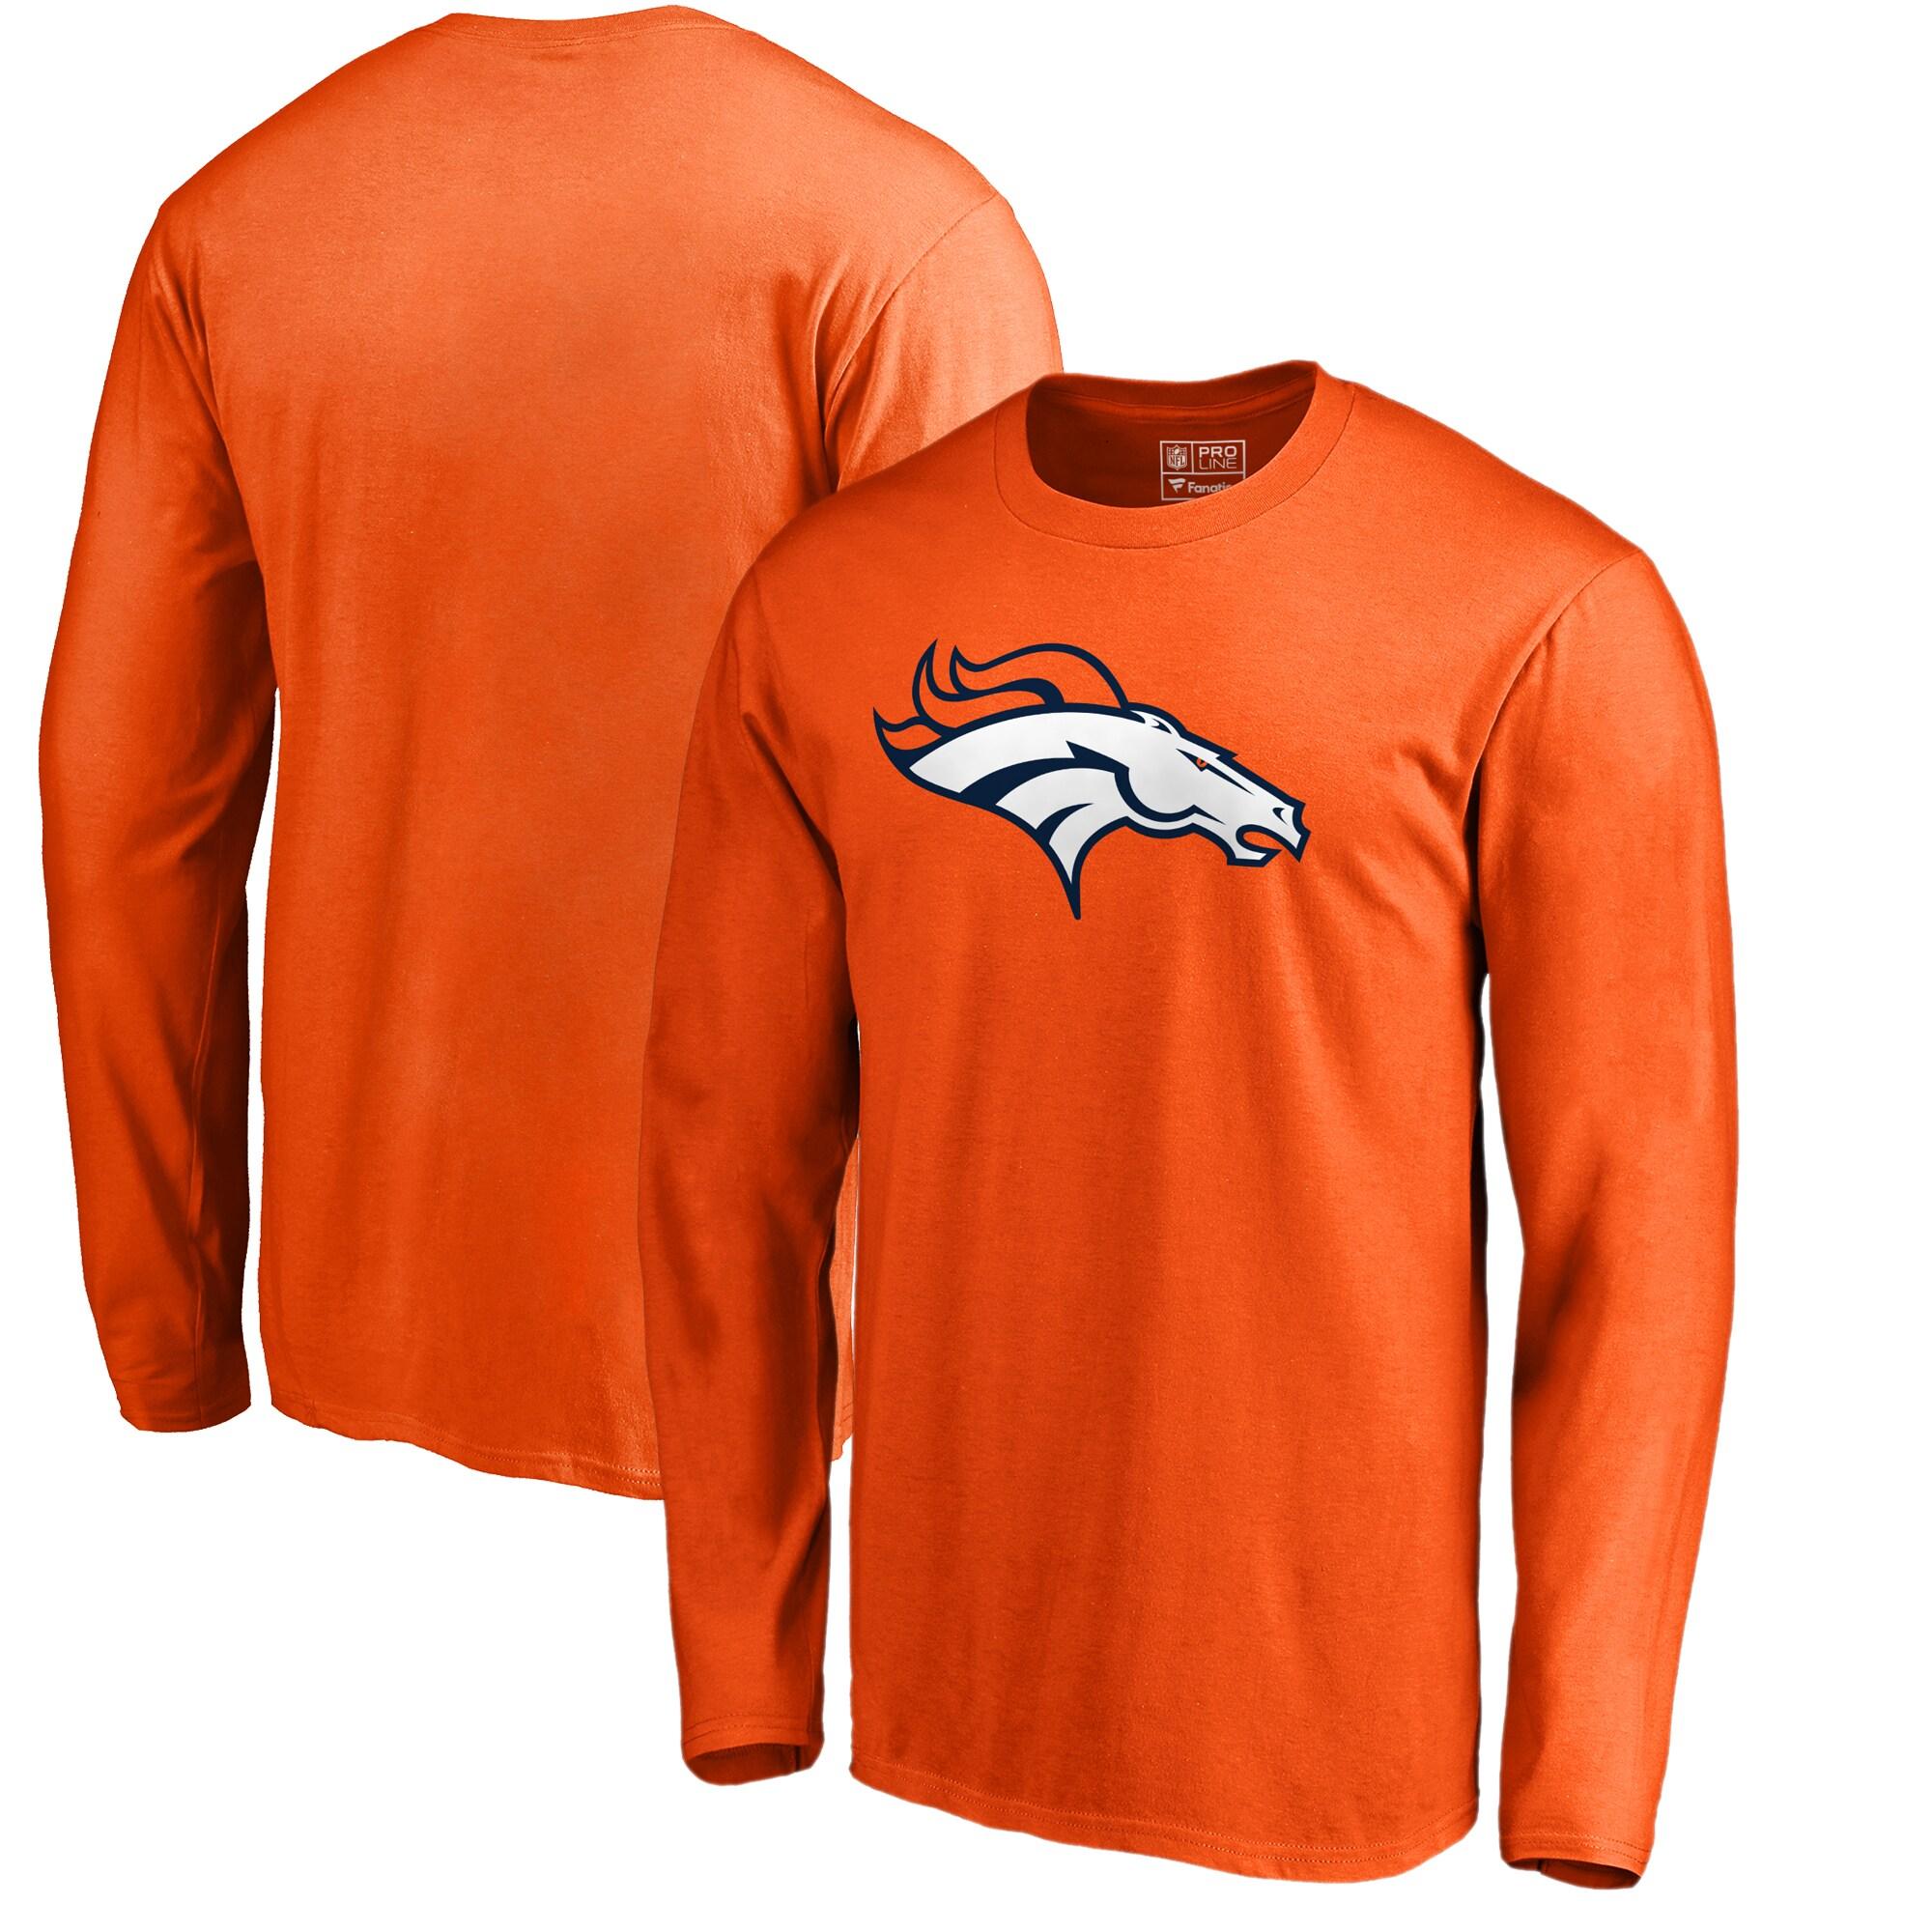 Denver Broncos NFL Pro Line by Fanatics Branded Primary Logo Big & Tall Long-Sleeve T-Shirt - Orange